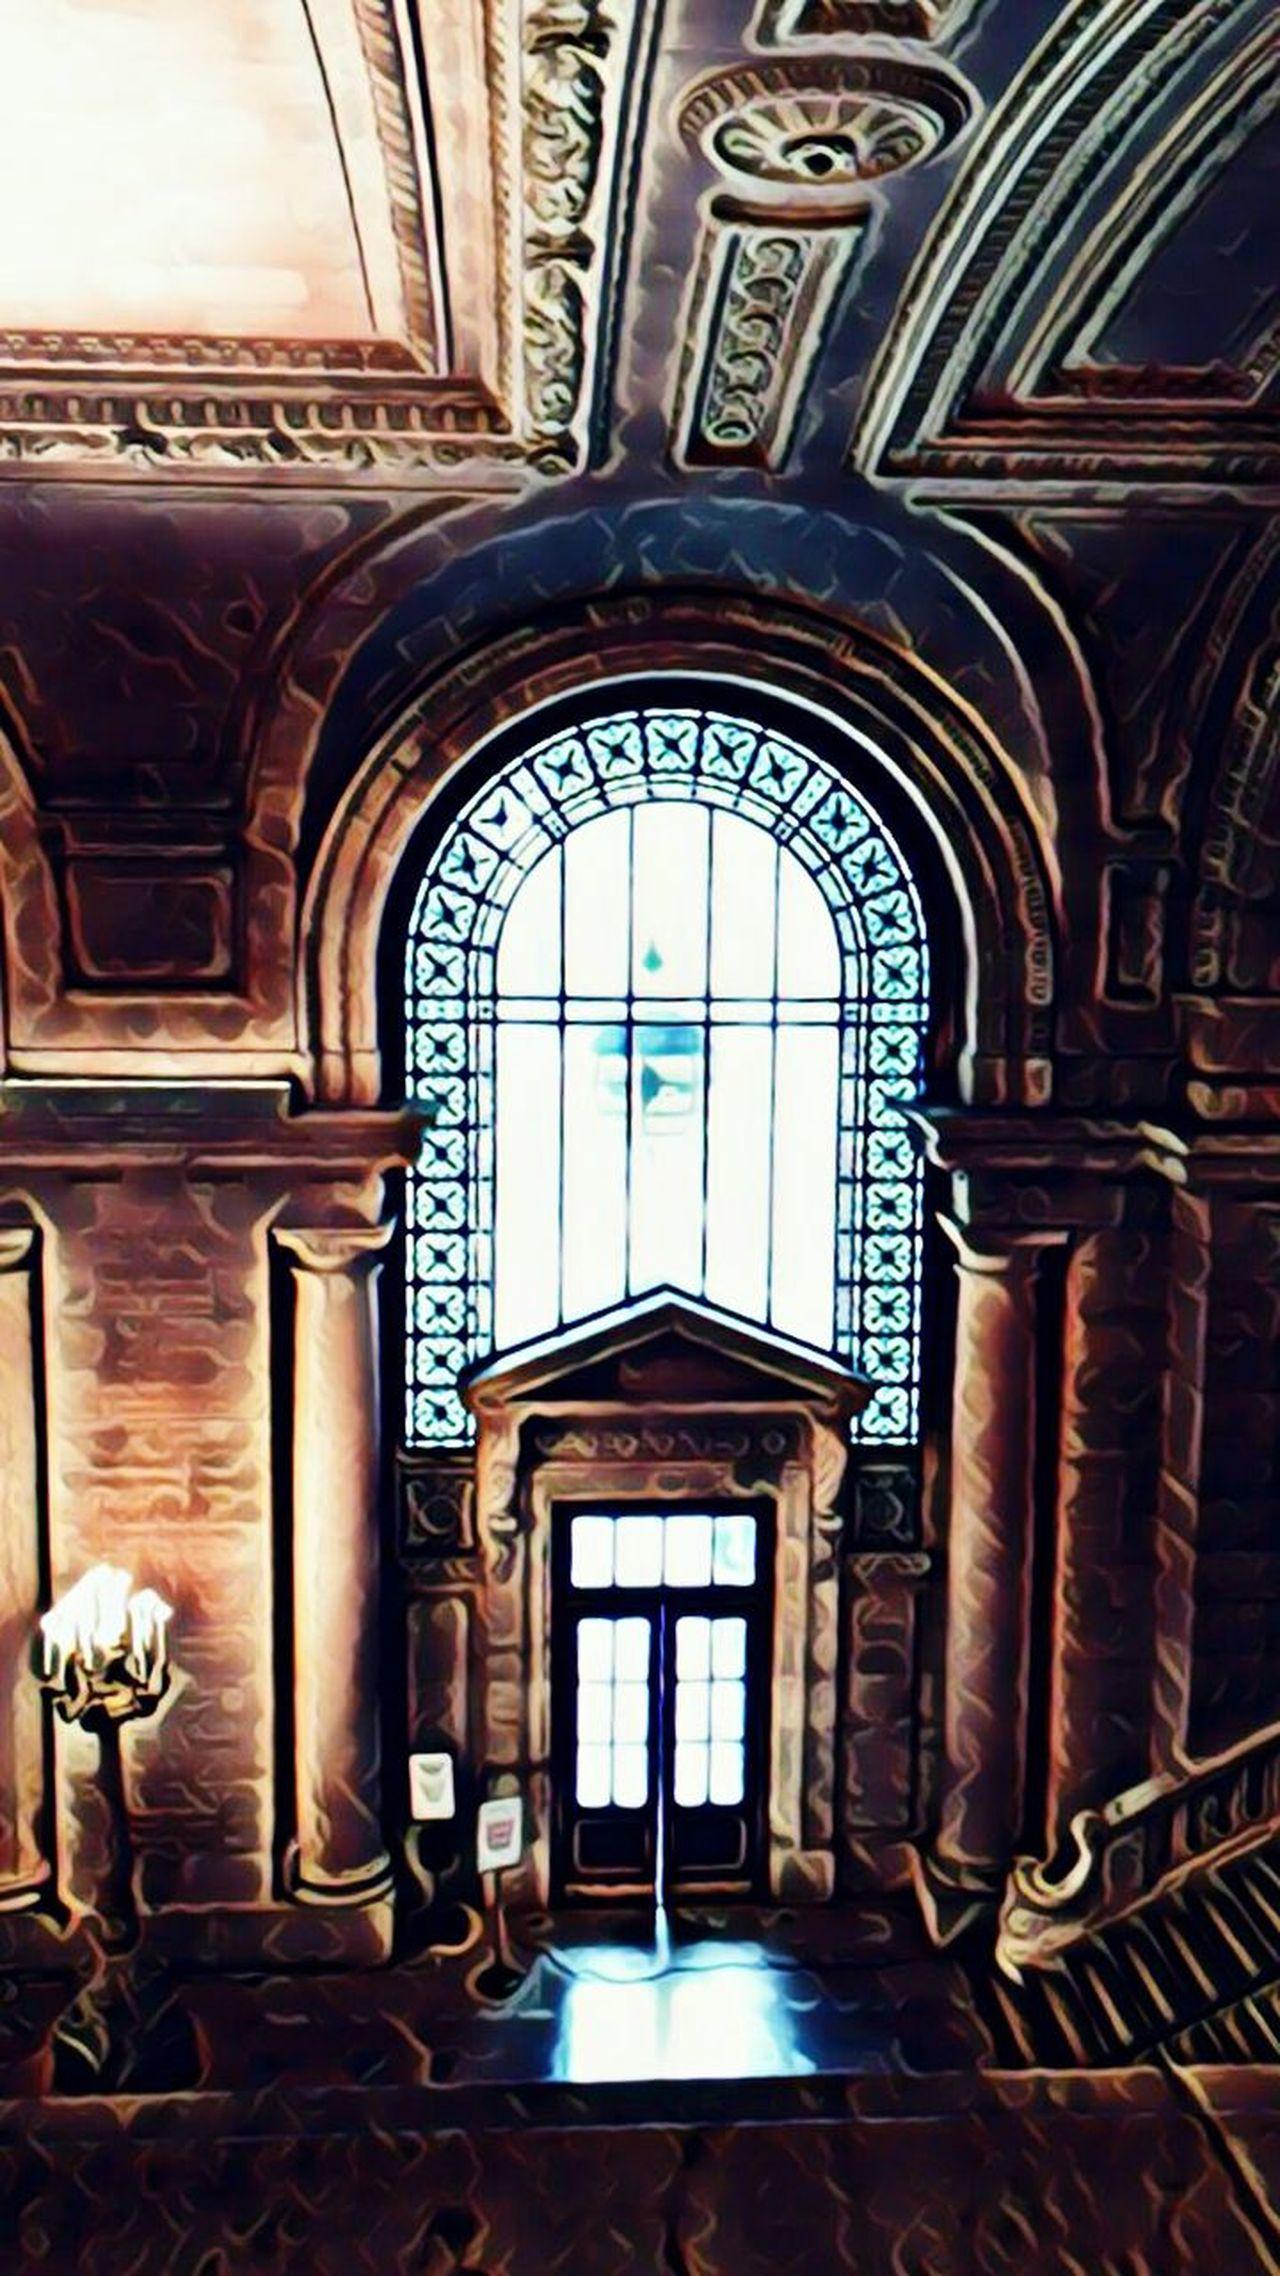 New York Public Library. Architecturelovers Enterance Detailphotography Mesmerized